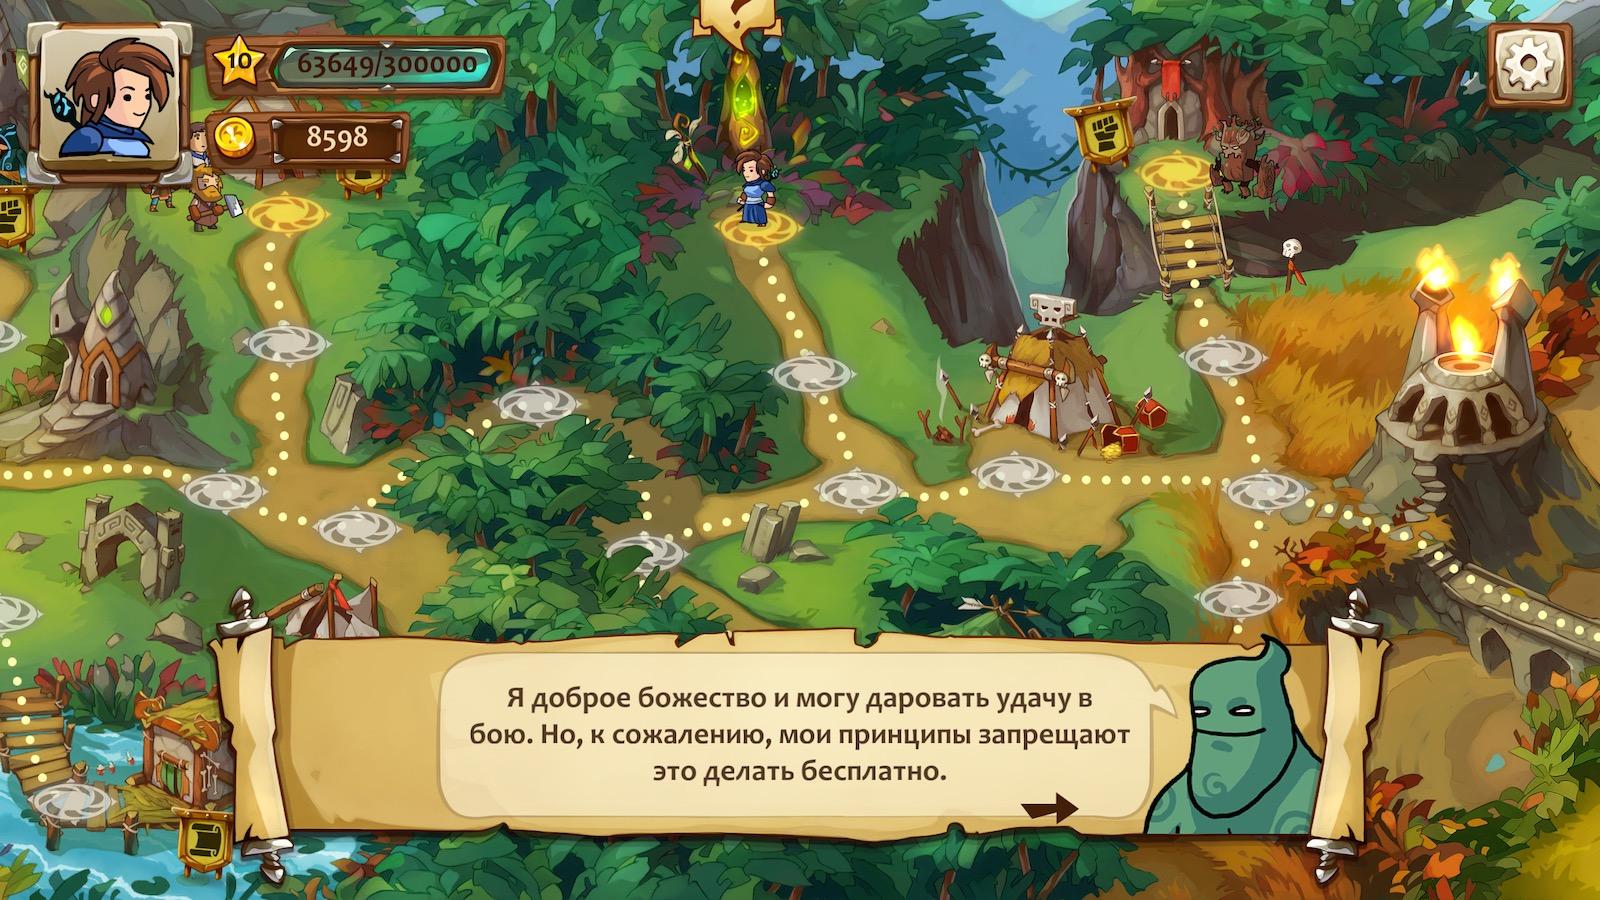 braveland wizard mag chn v yni hrabrozem ya 12 - Braveland Wizard: магічні війни Храброземья